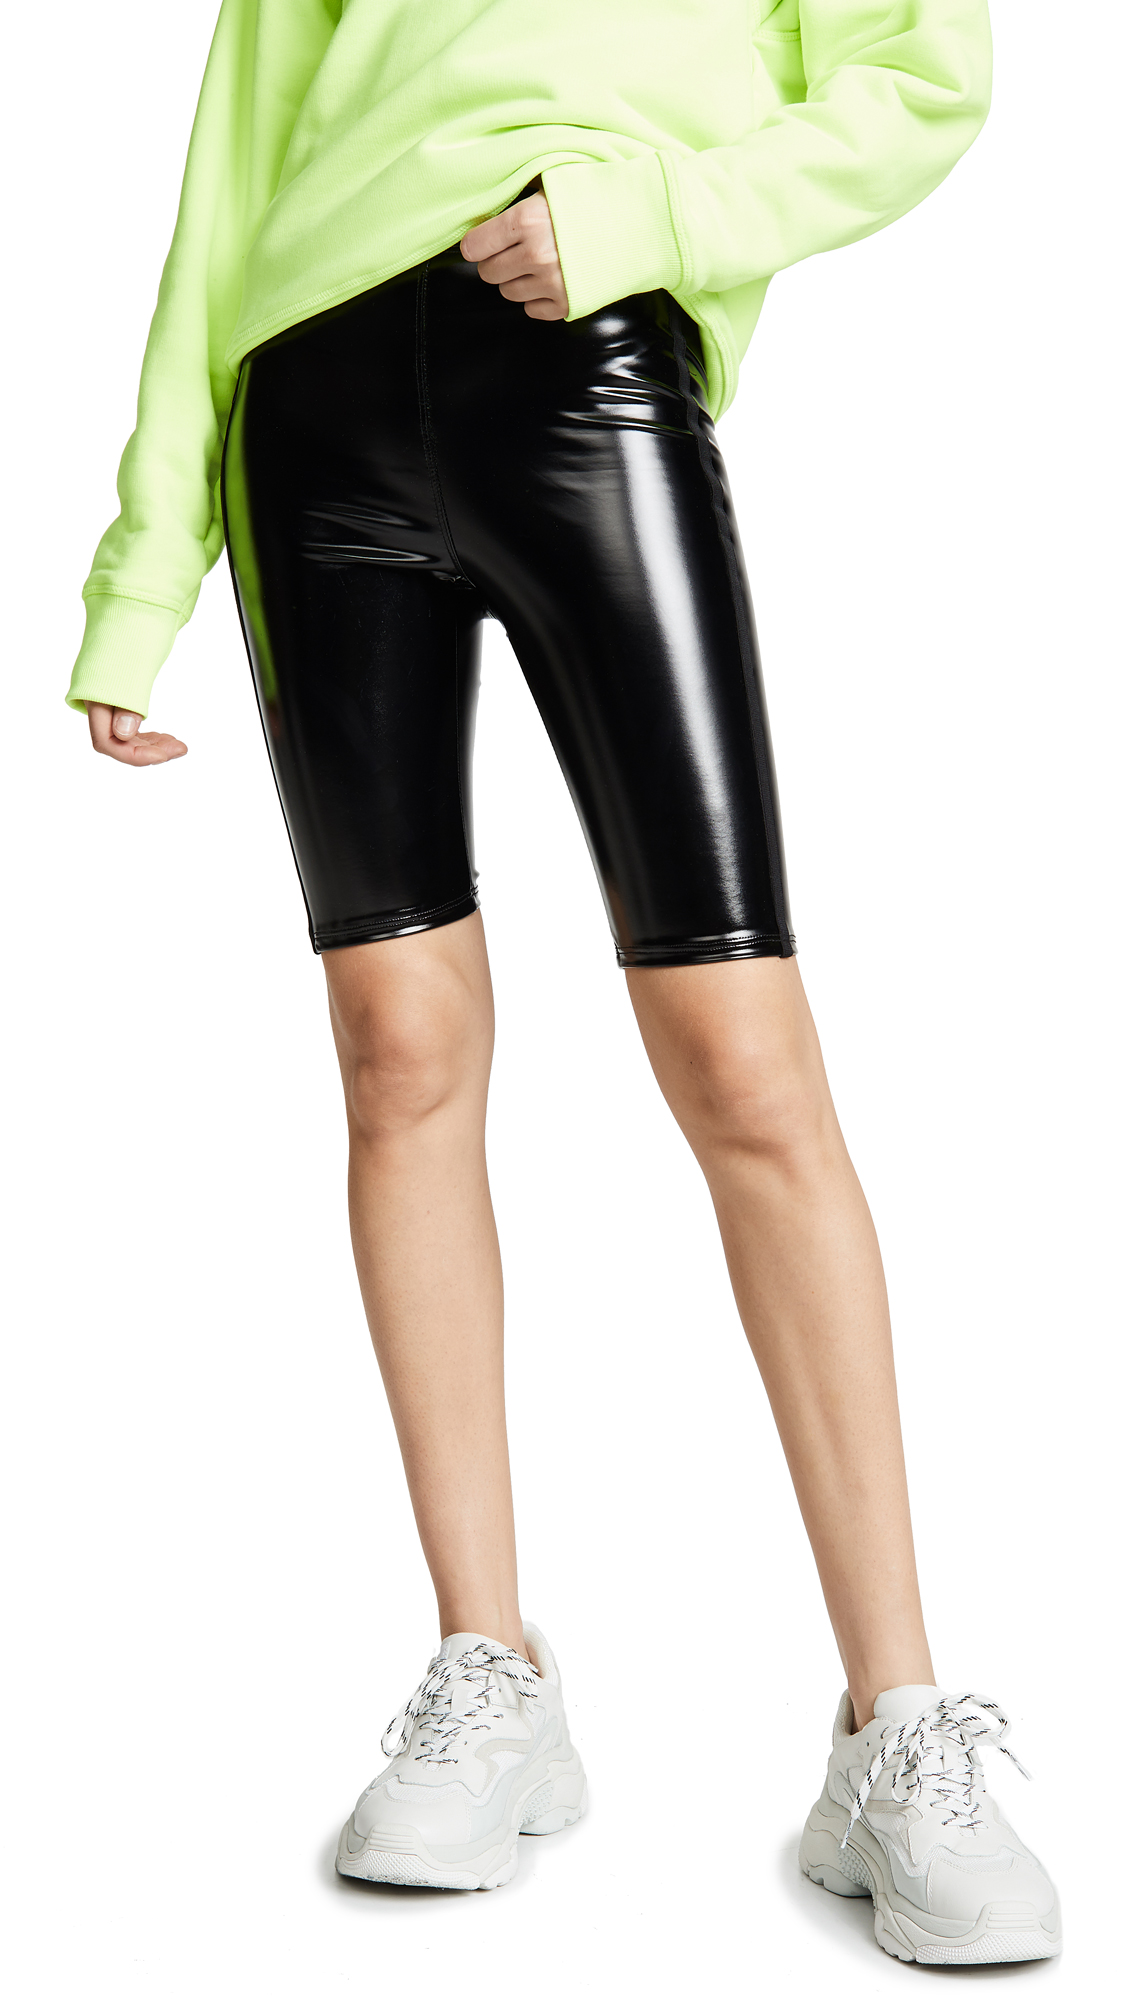 Heroine Sport Downtown Patent Biker Shorts